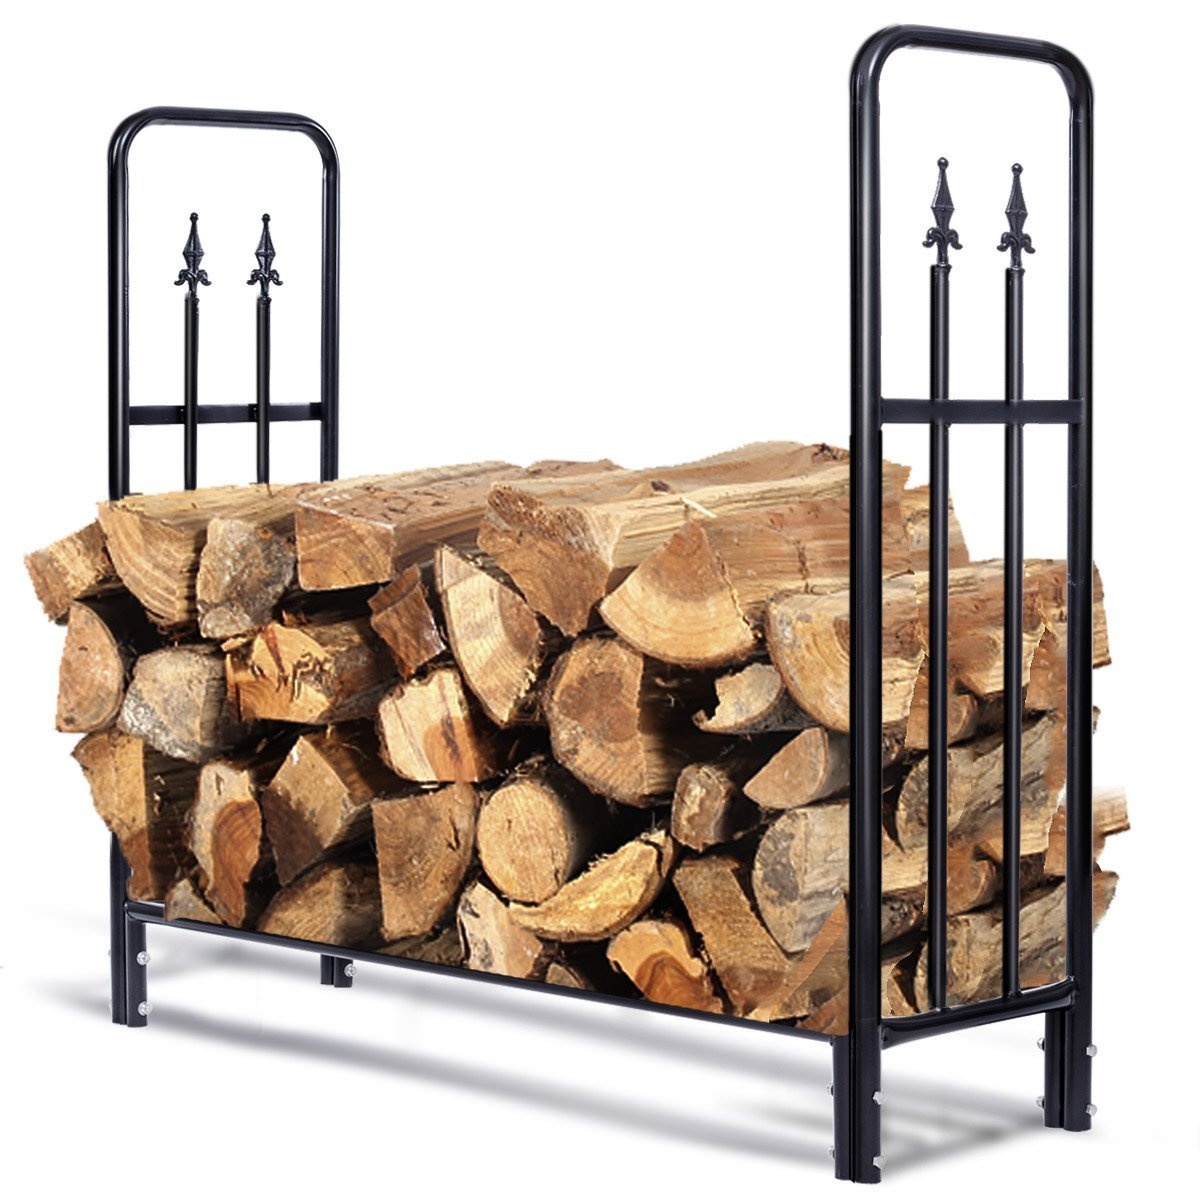 Goplus Firewood Log Rack Indoor Outdoor Fireplace Storage Holder Logs Heavy Duty Steel Wood Stacking Holder Kindling Wood Stove Accessories Tools Accessories (4 Feet) by Goplus